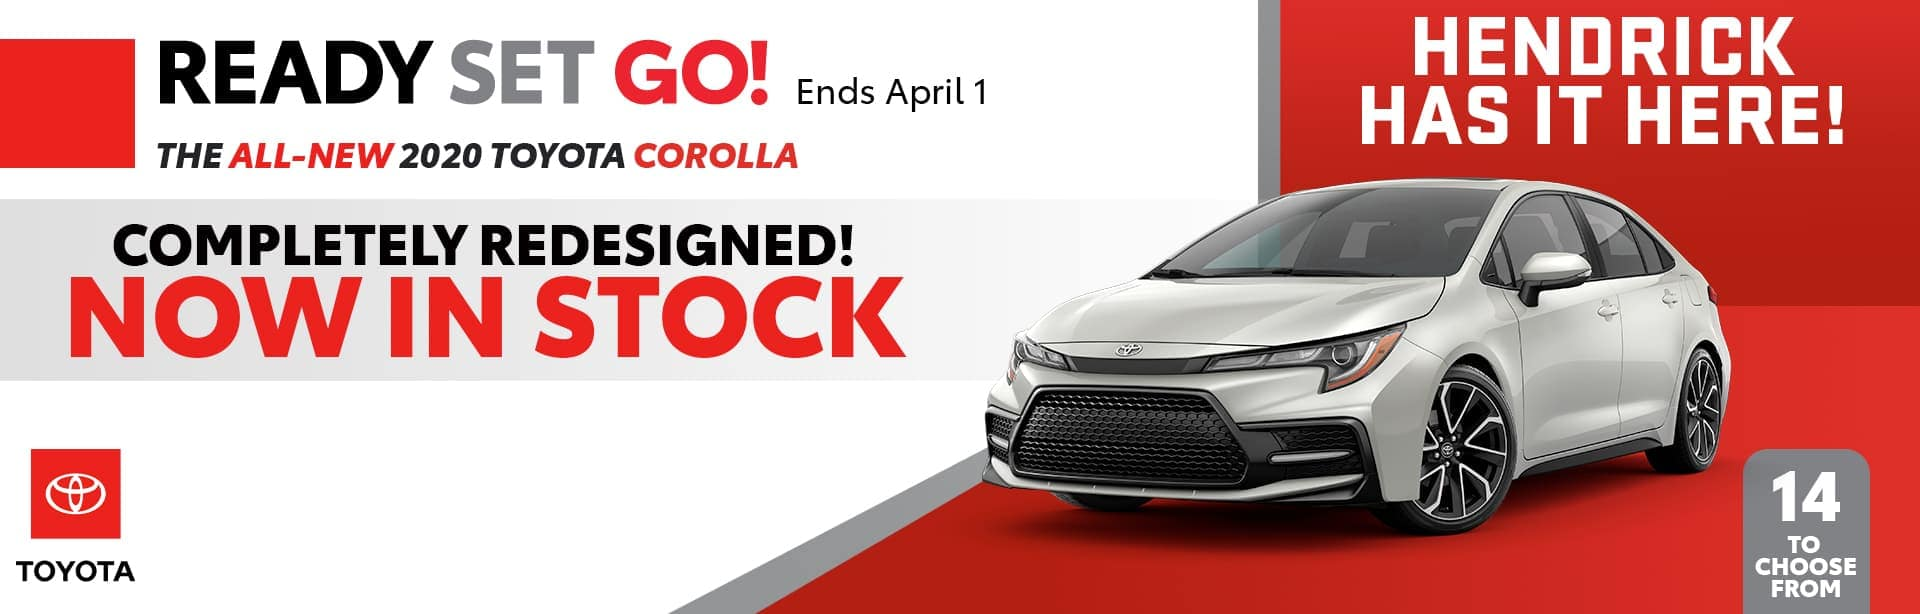 2020 Toyota Corolla promo banner